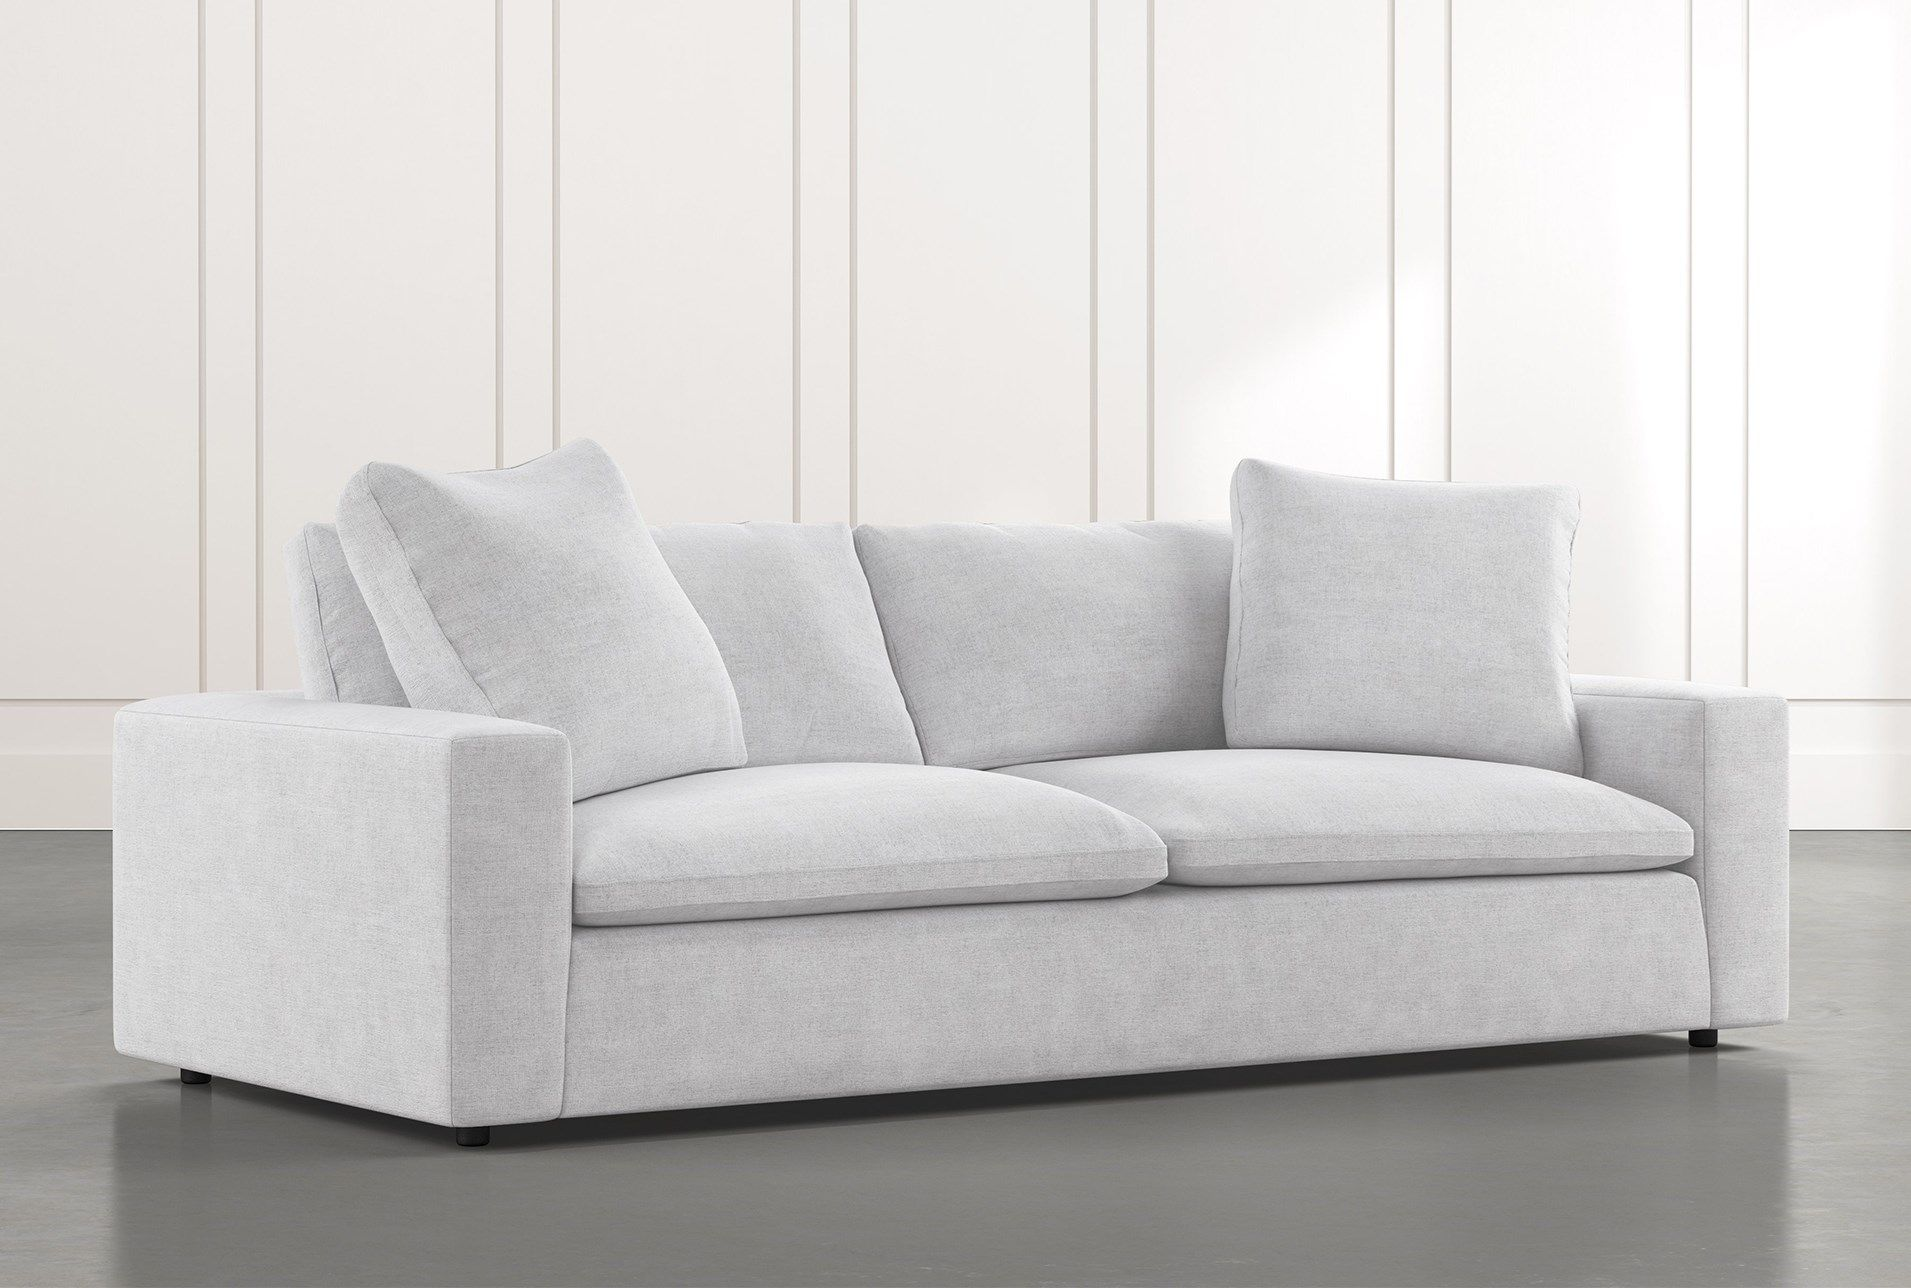 Utopia Light Grey Sofa Light Gray Sofas Gray Sofa Gray Sofa Living